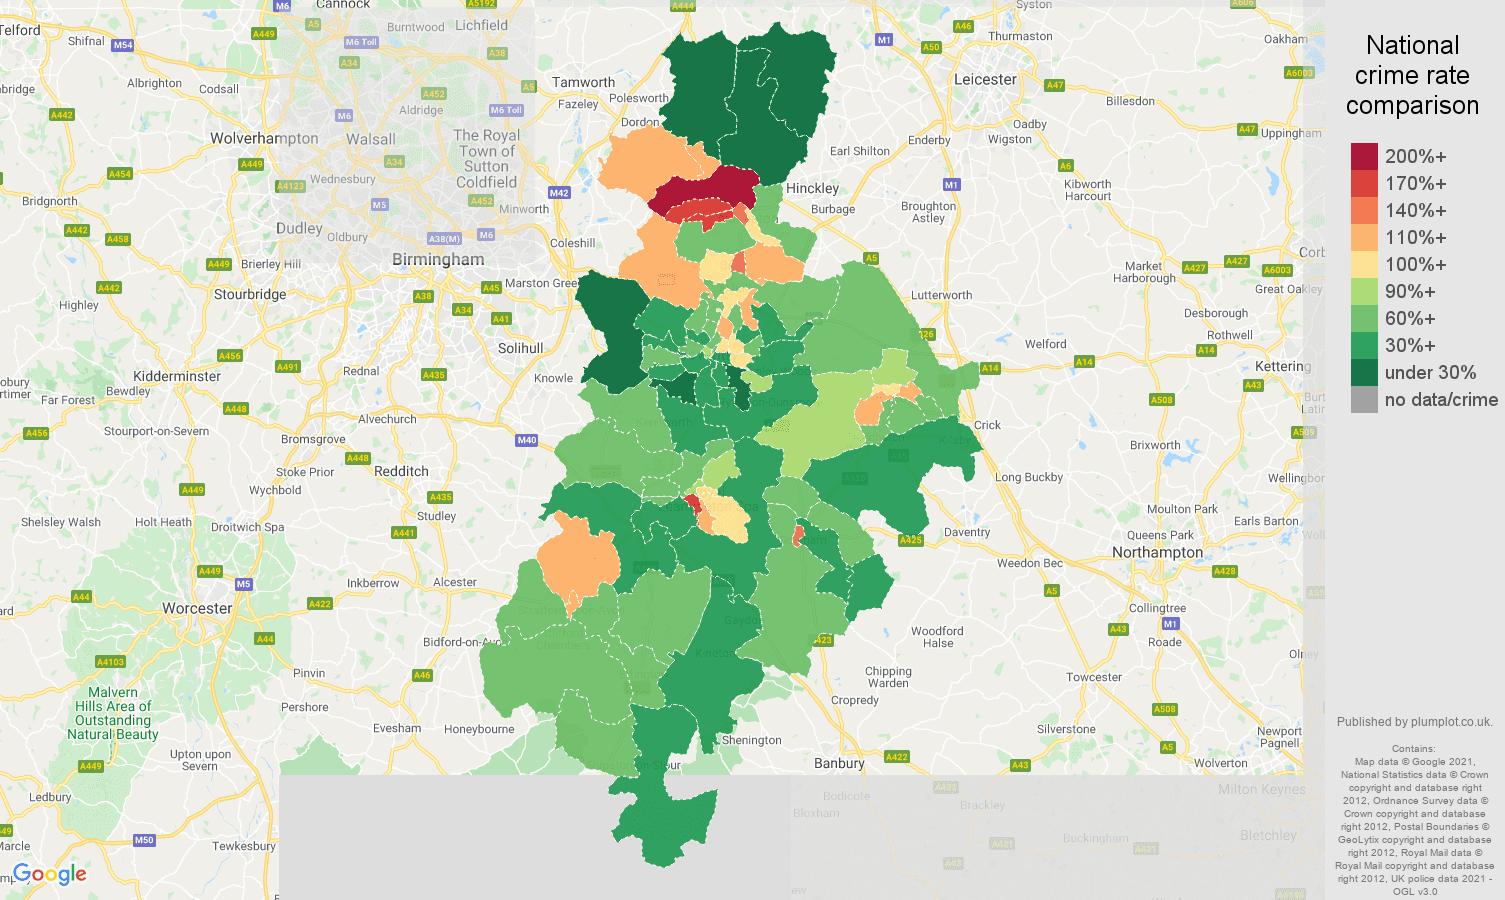 Coventry antisocial behaviour crime rate comparison map